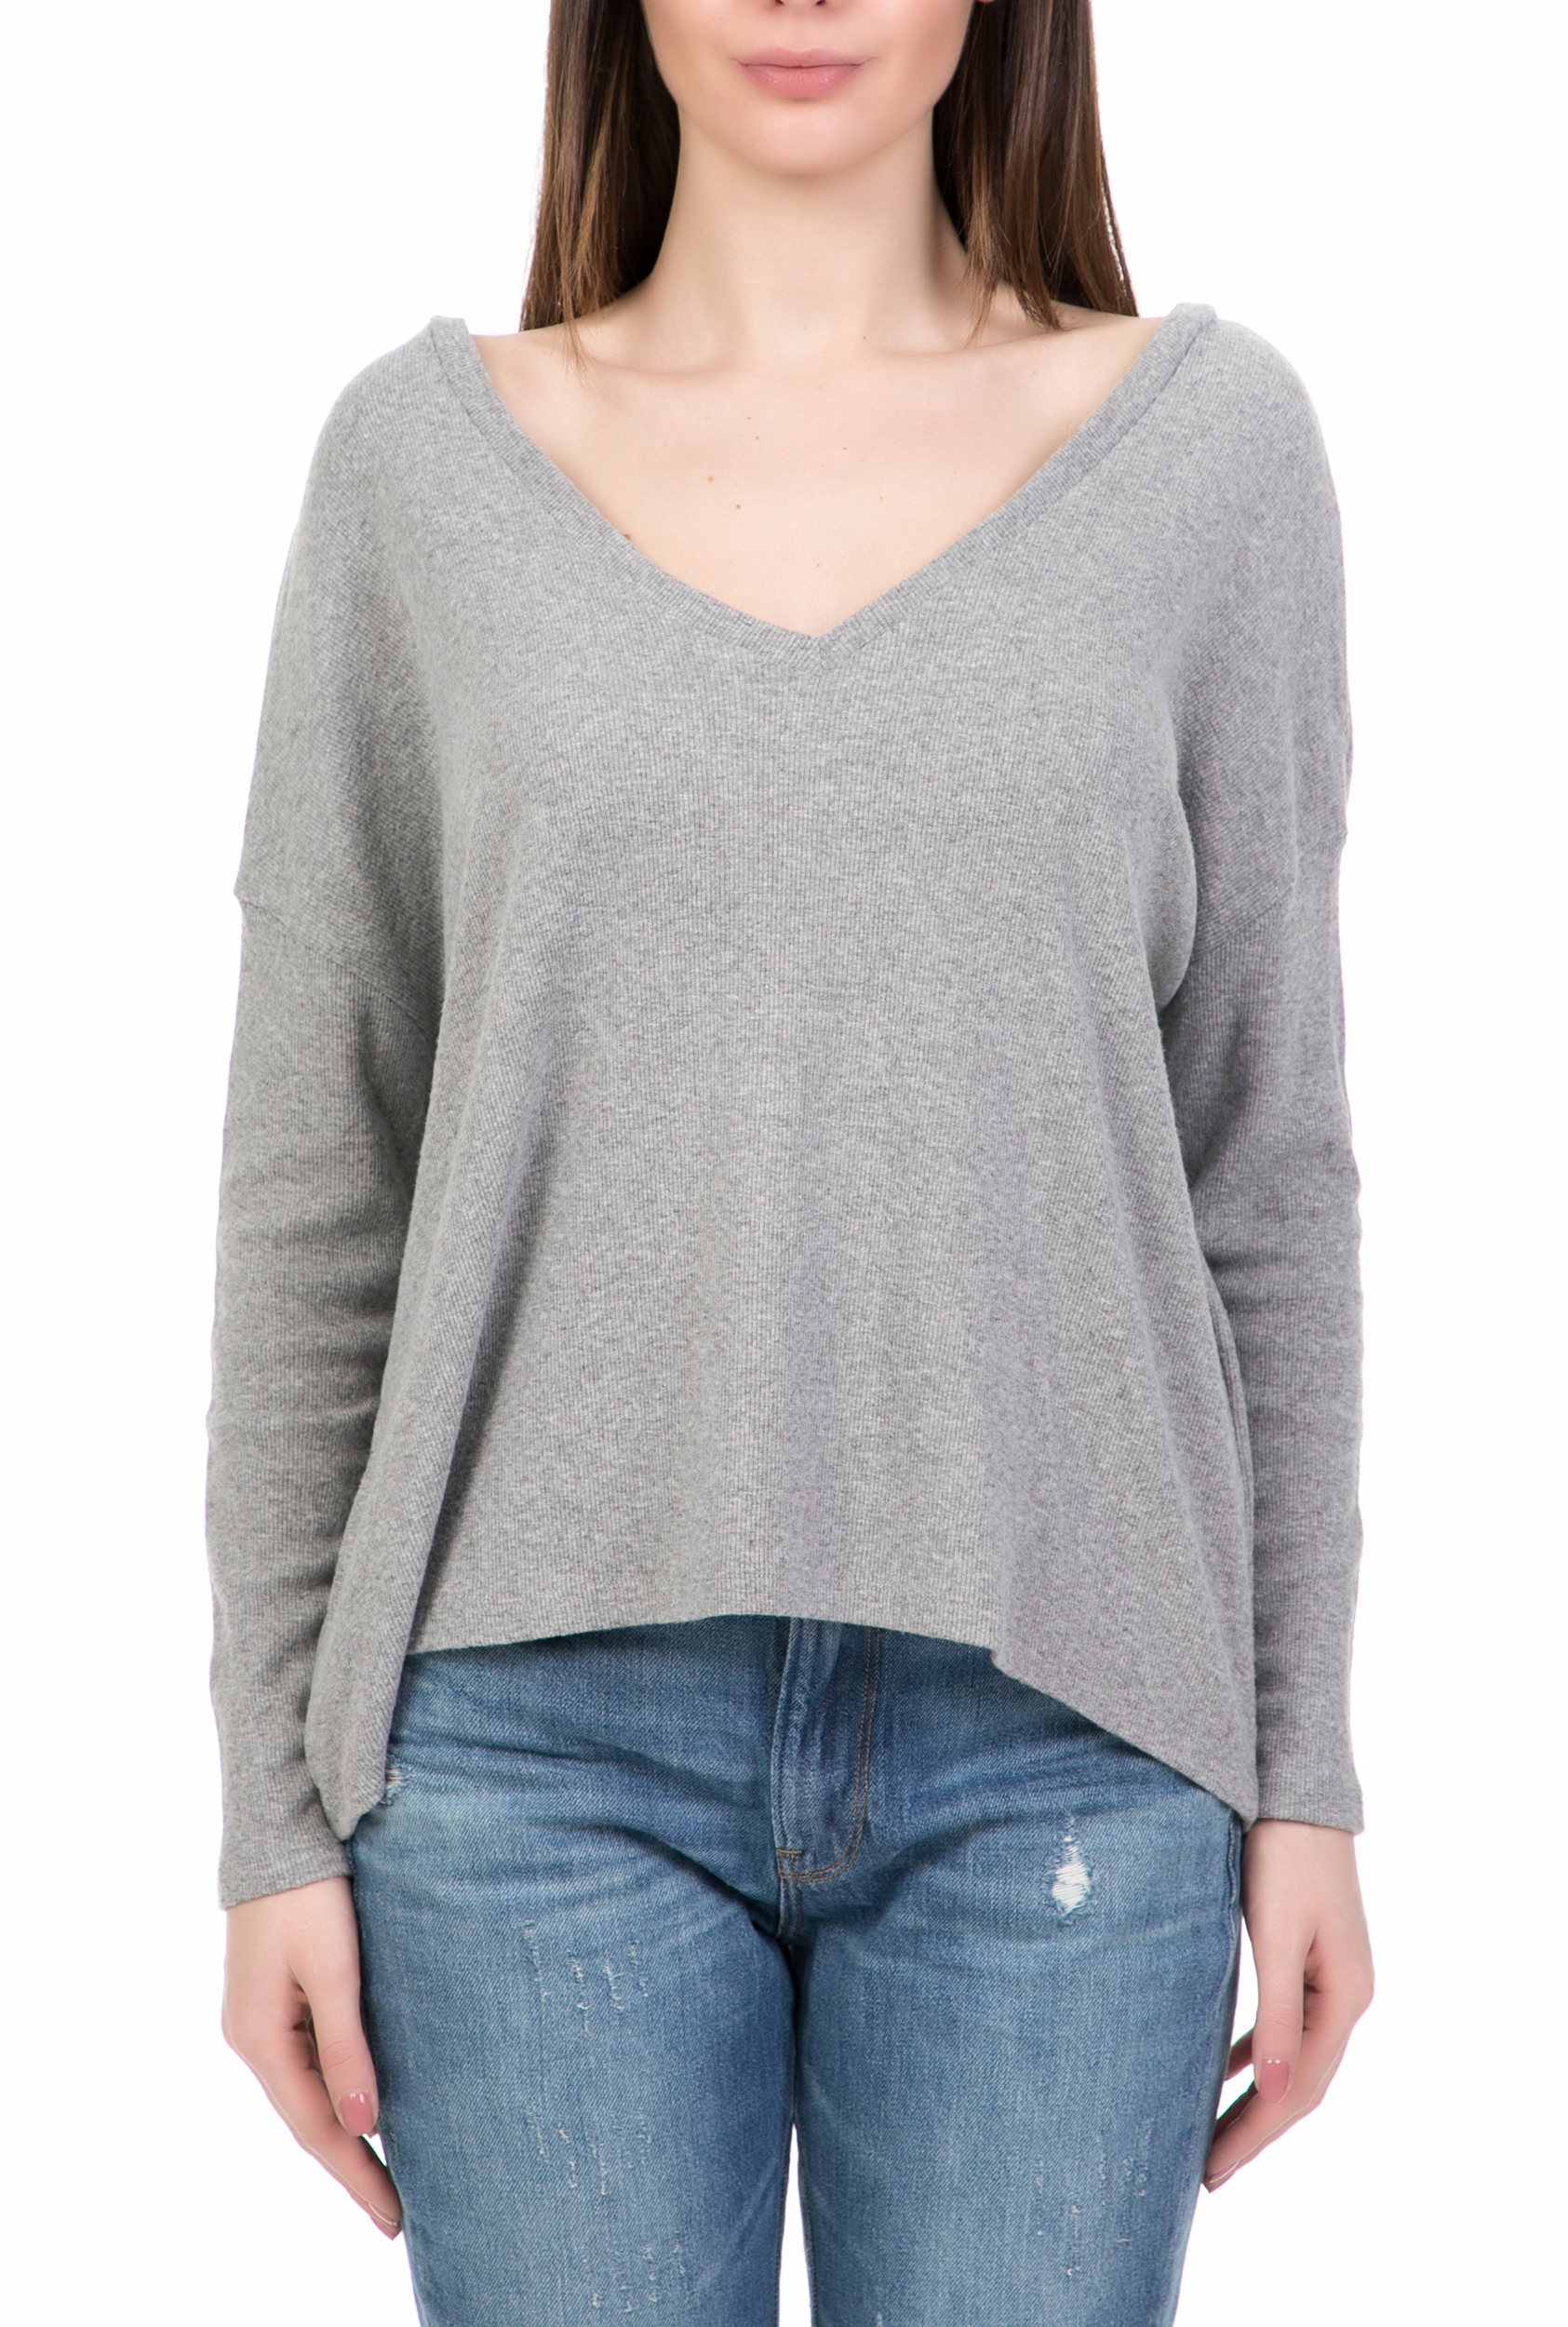 0bc6521c84f4 AMERICAN VINTAGE - Γυναικεία μακρυμάνικη μπλούζα AMERICAN VINTAGE γκρι